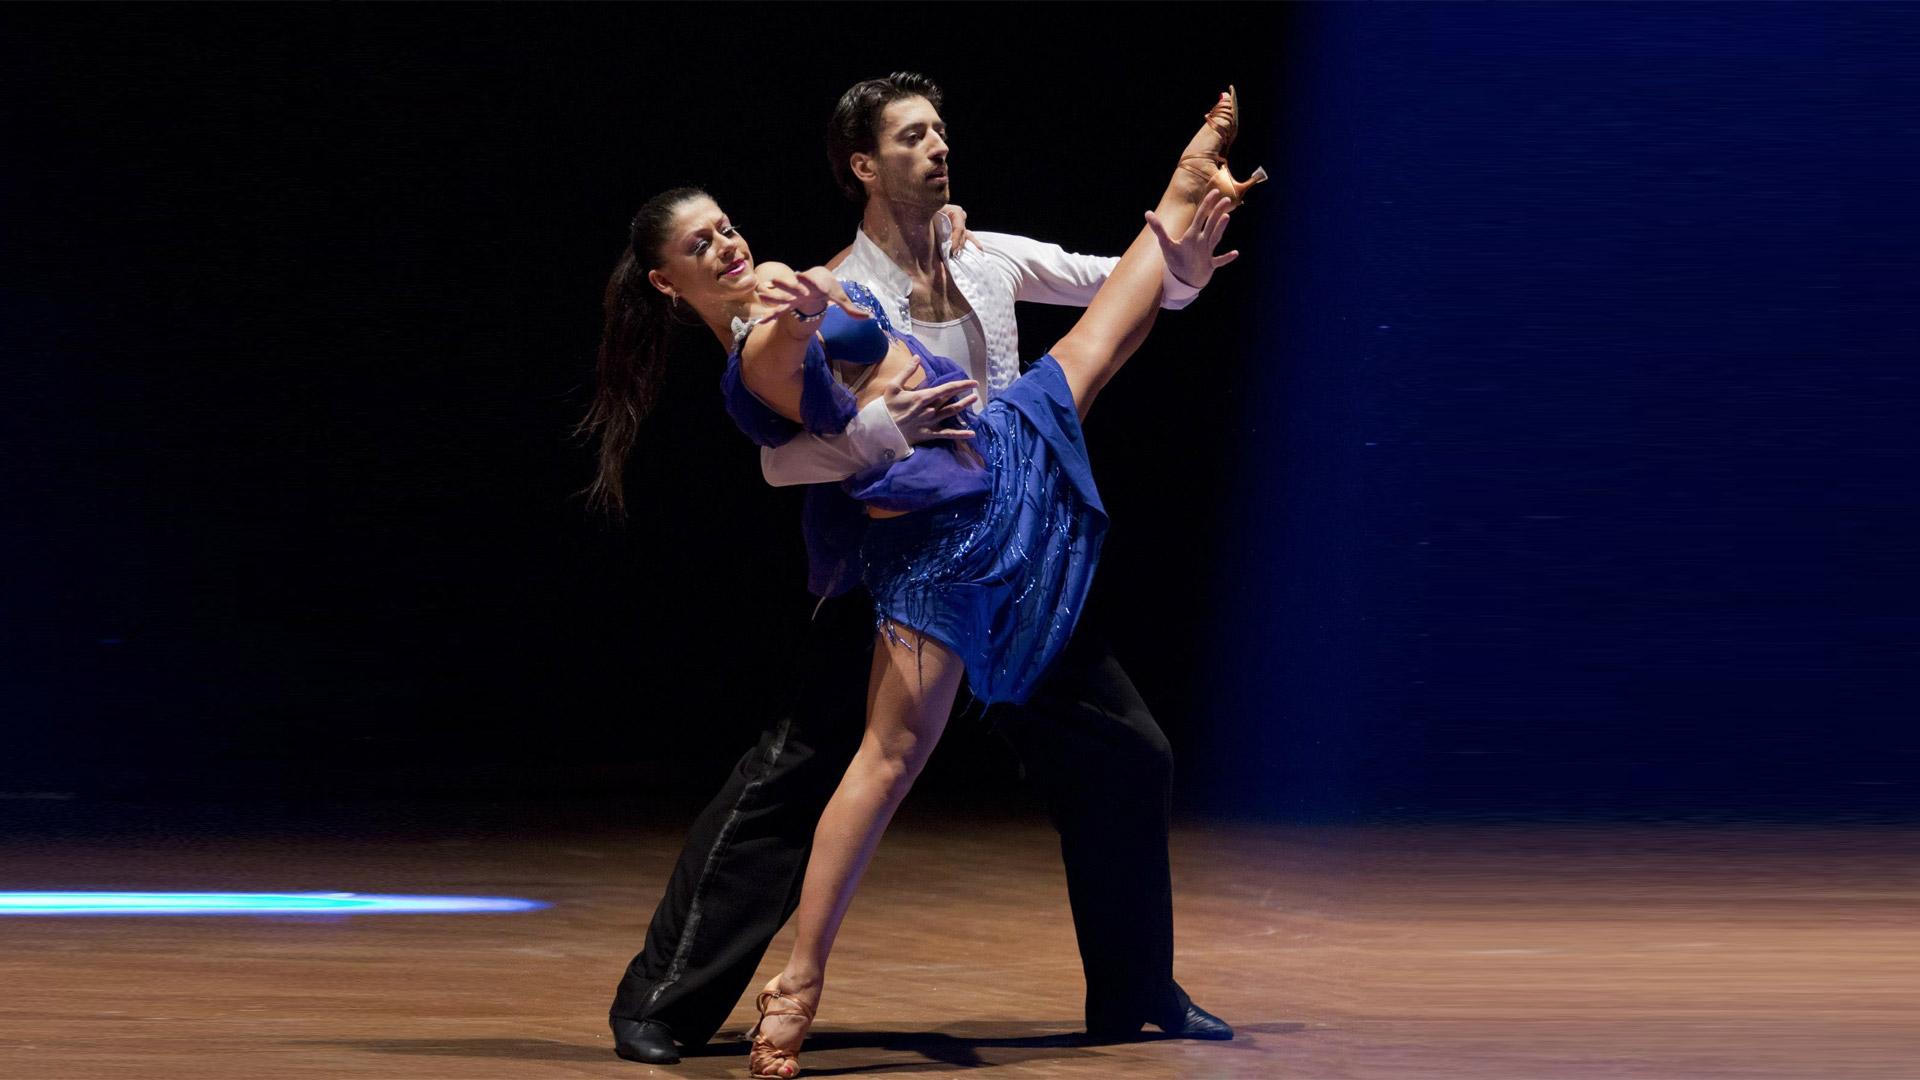 latin dance videos - HD1920×1080